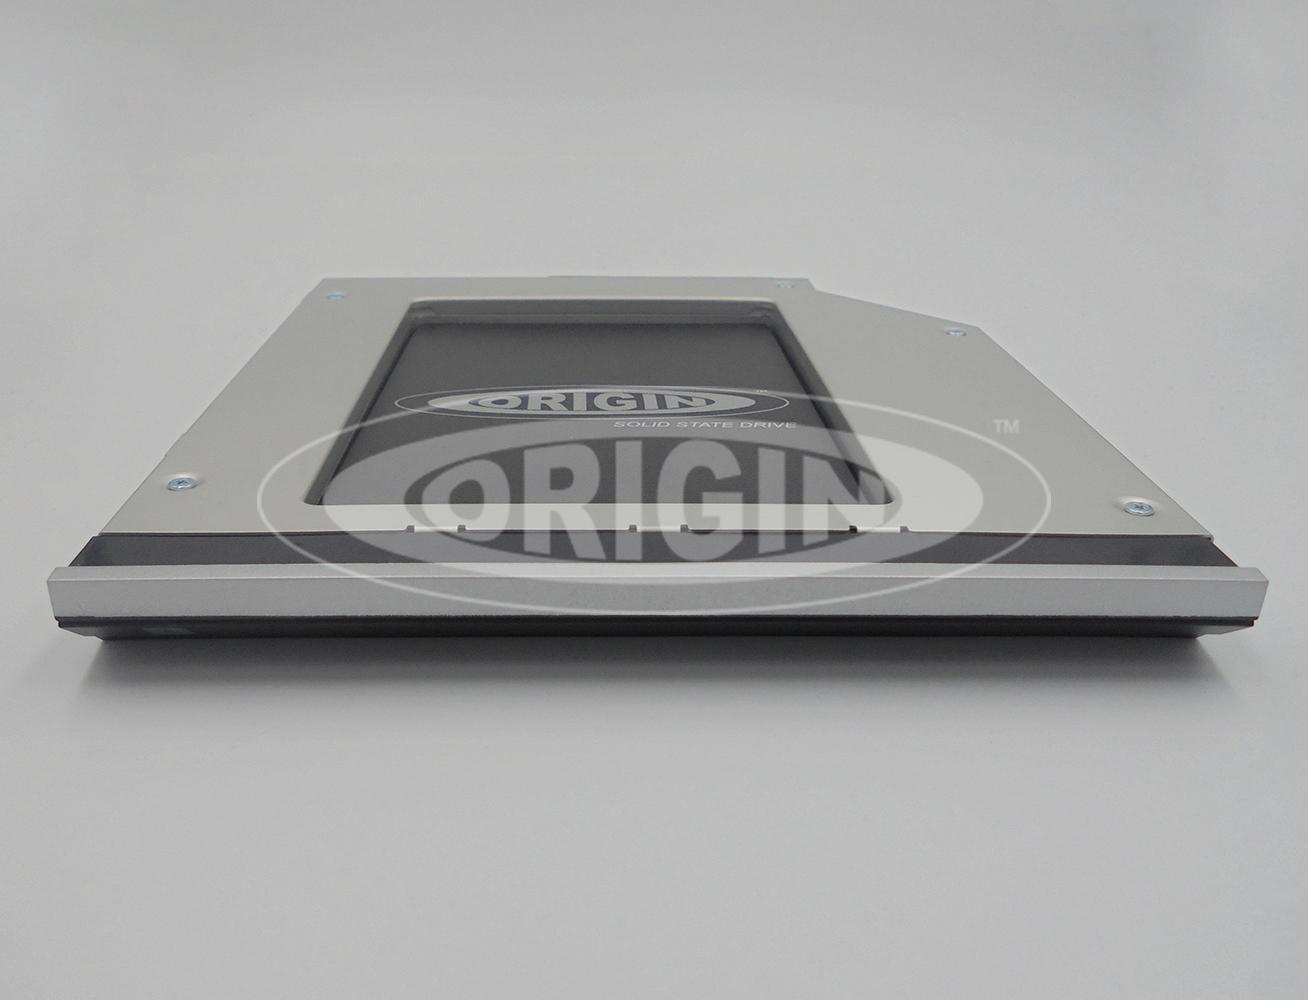 SSD SATA 2.5in 128GB for Elitebook 8760w